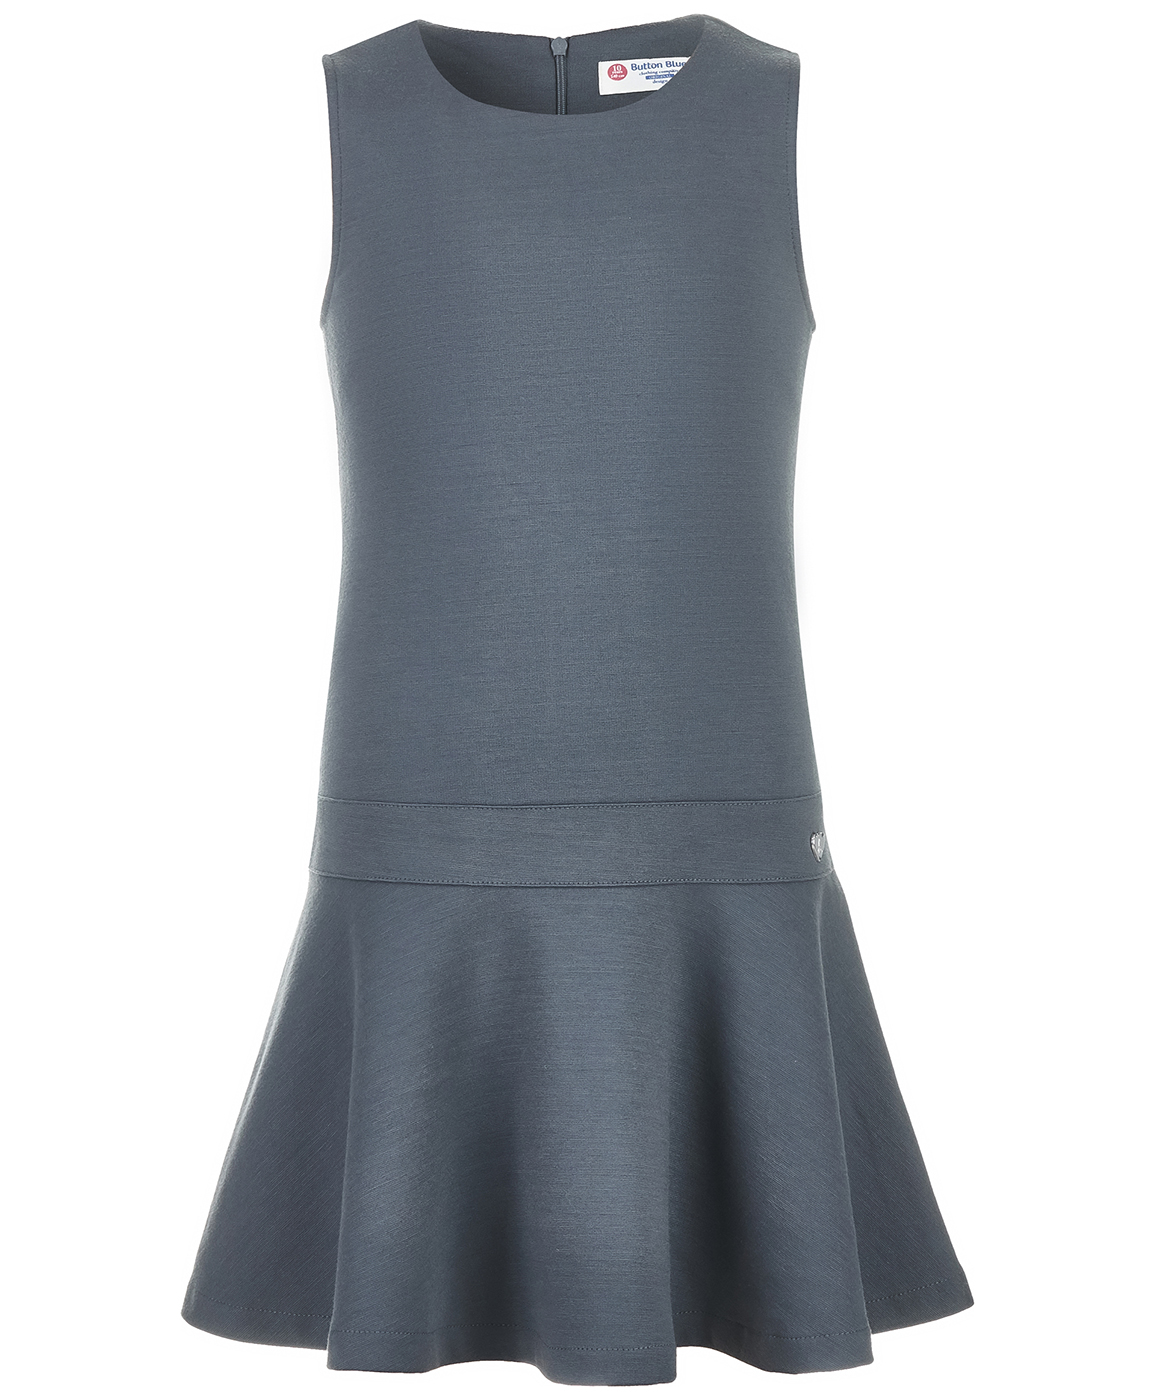 Купить 218BBGS50020100, Сарафан для девочек Button Blue, цв. серый, р-р 164,